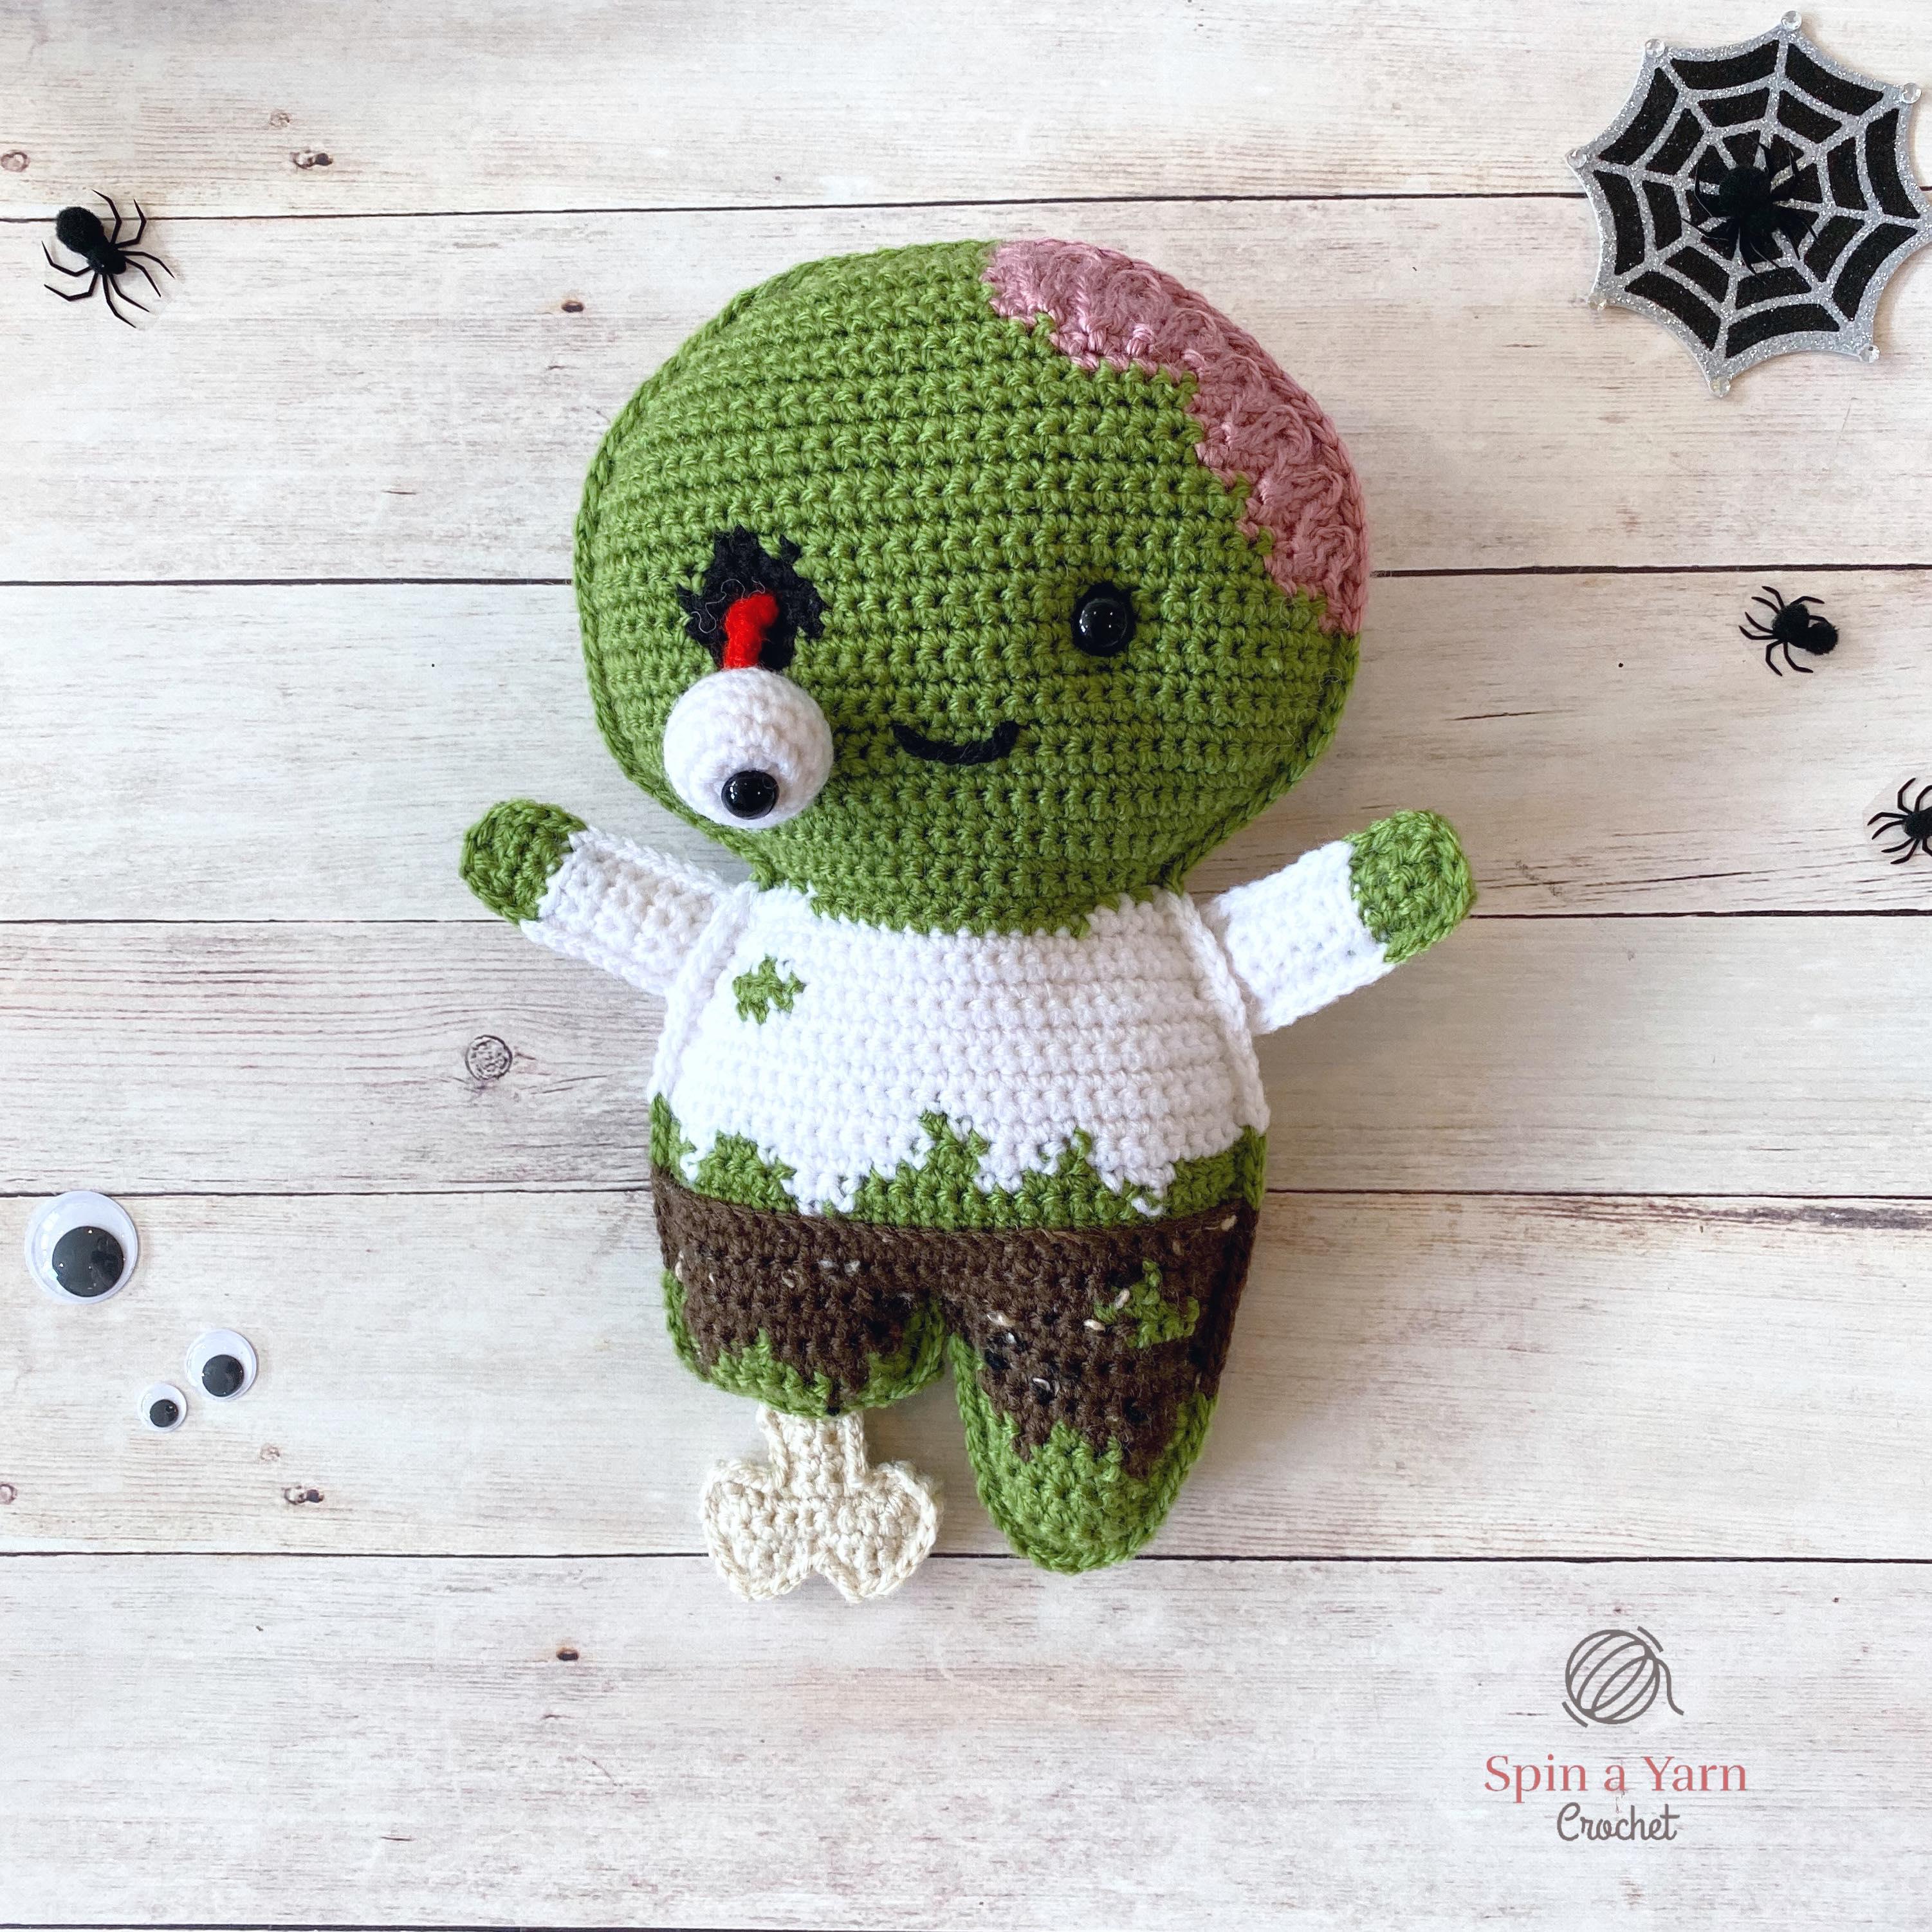 Crochet Pattern Brain Cupcake Amigurumi Brain Cupcake pdf tutorial